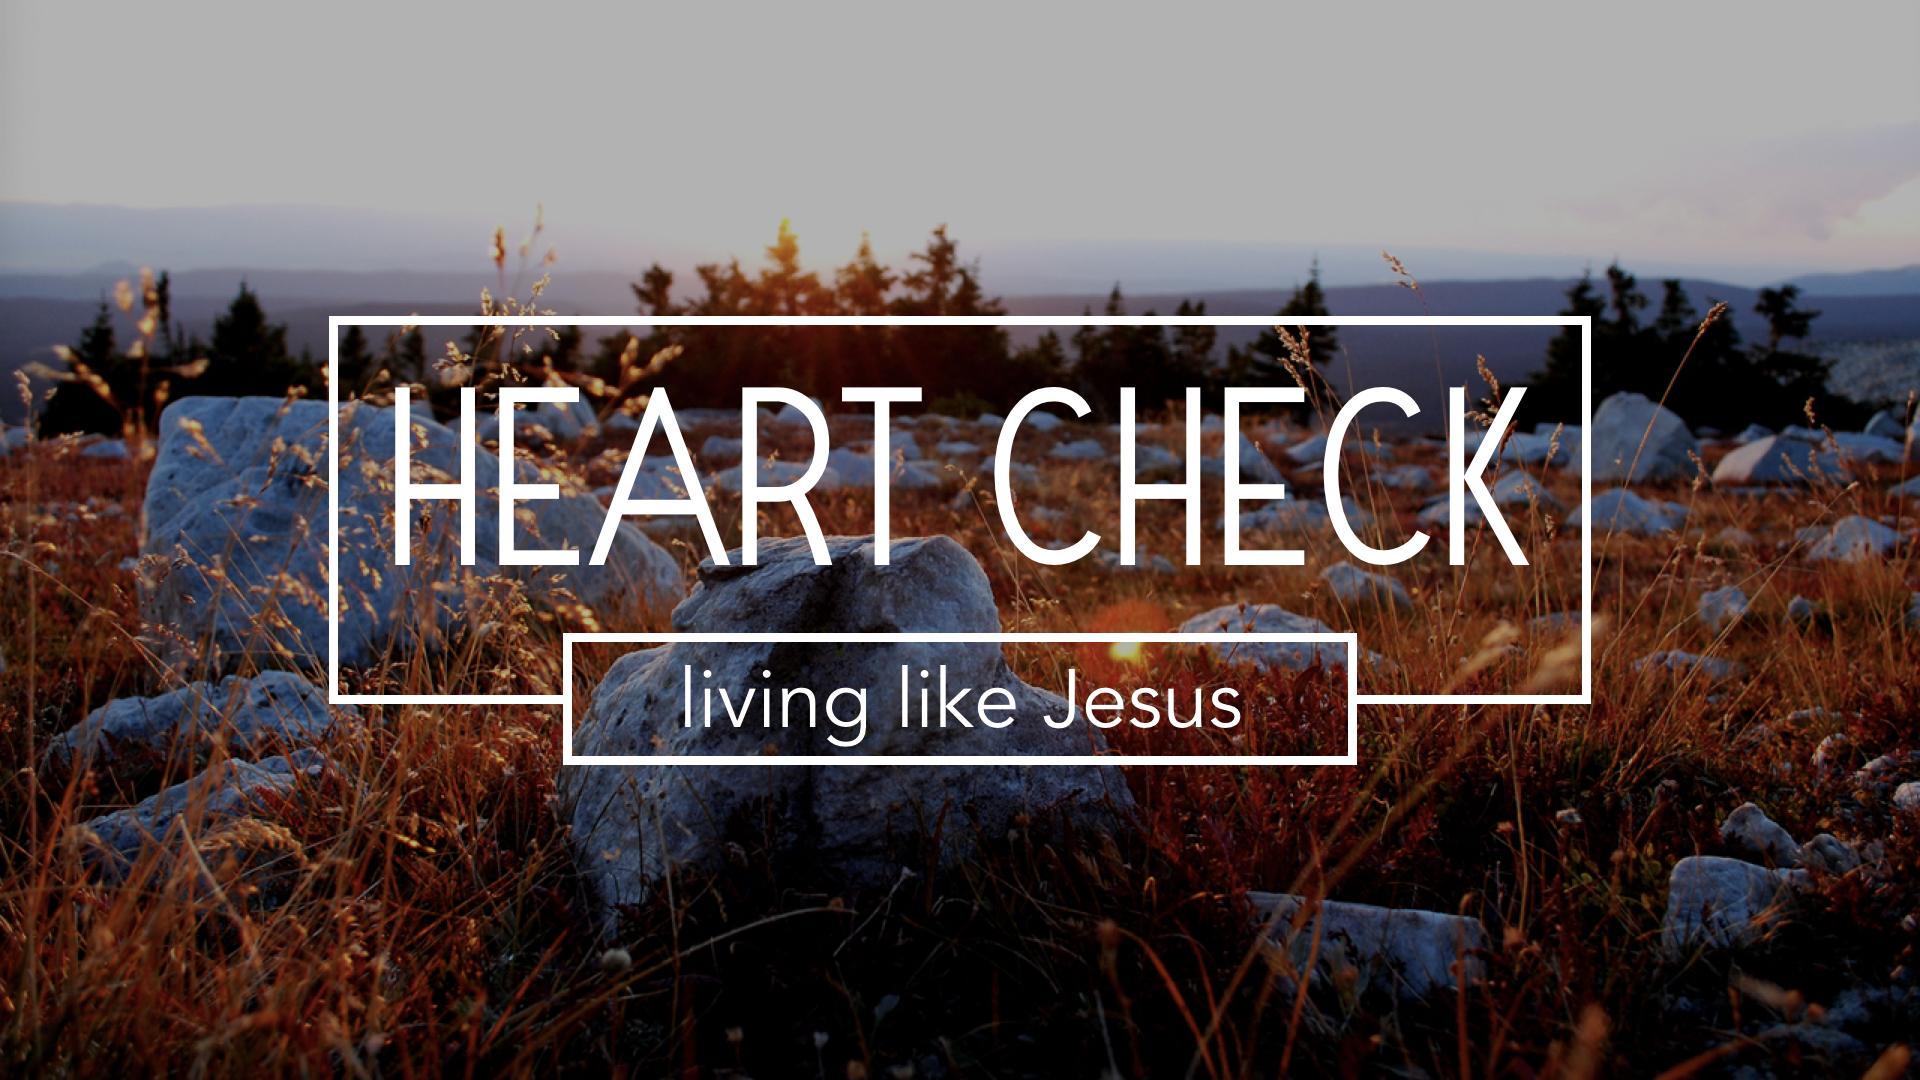 HEART CHECK, Living like Jesus